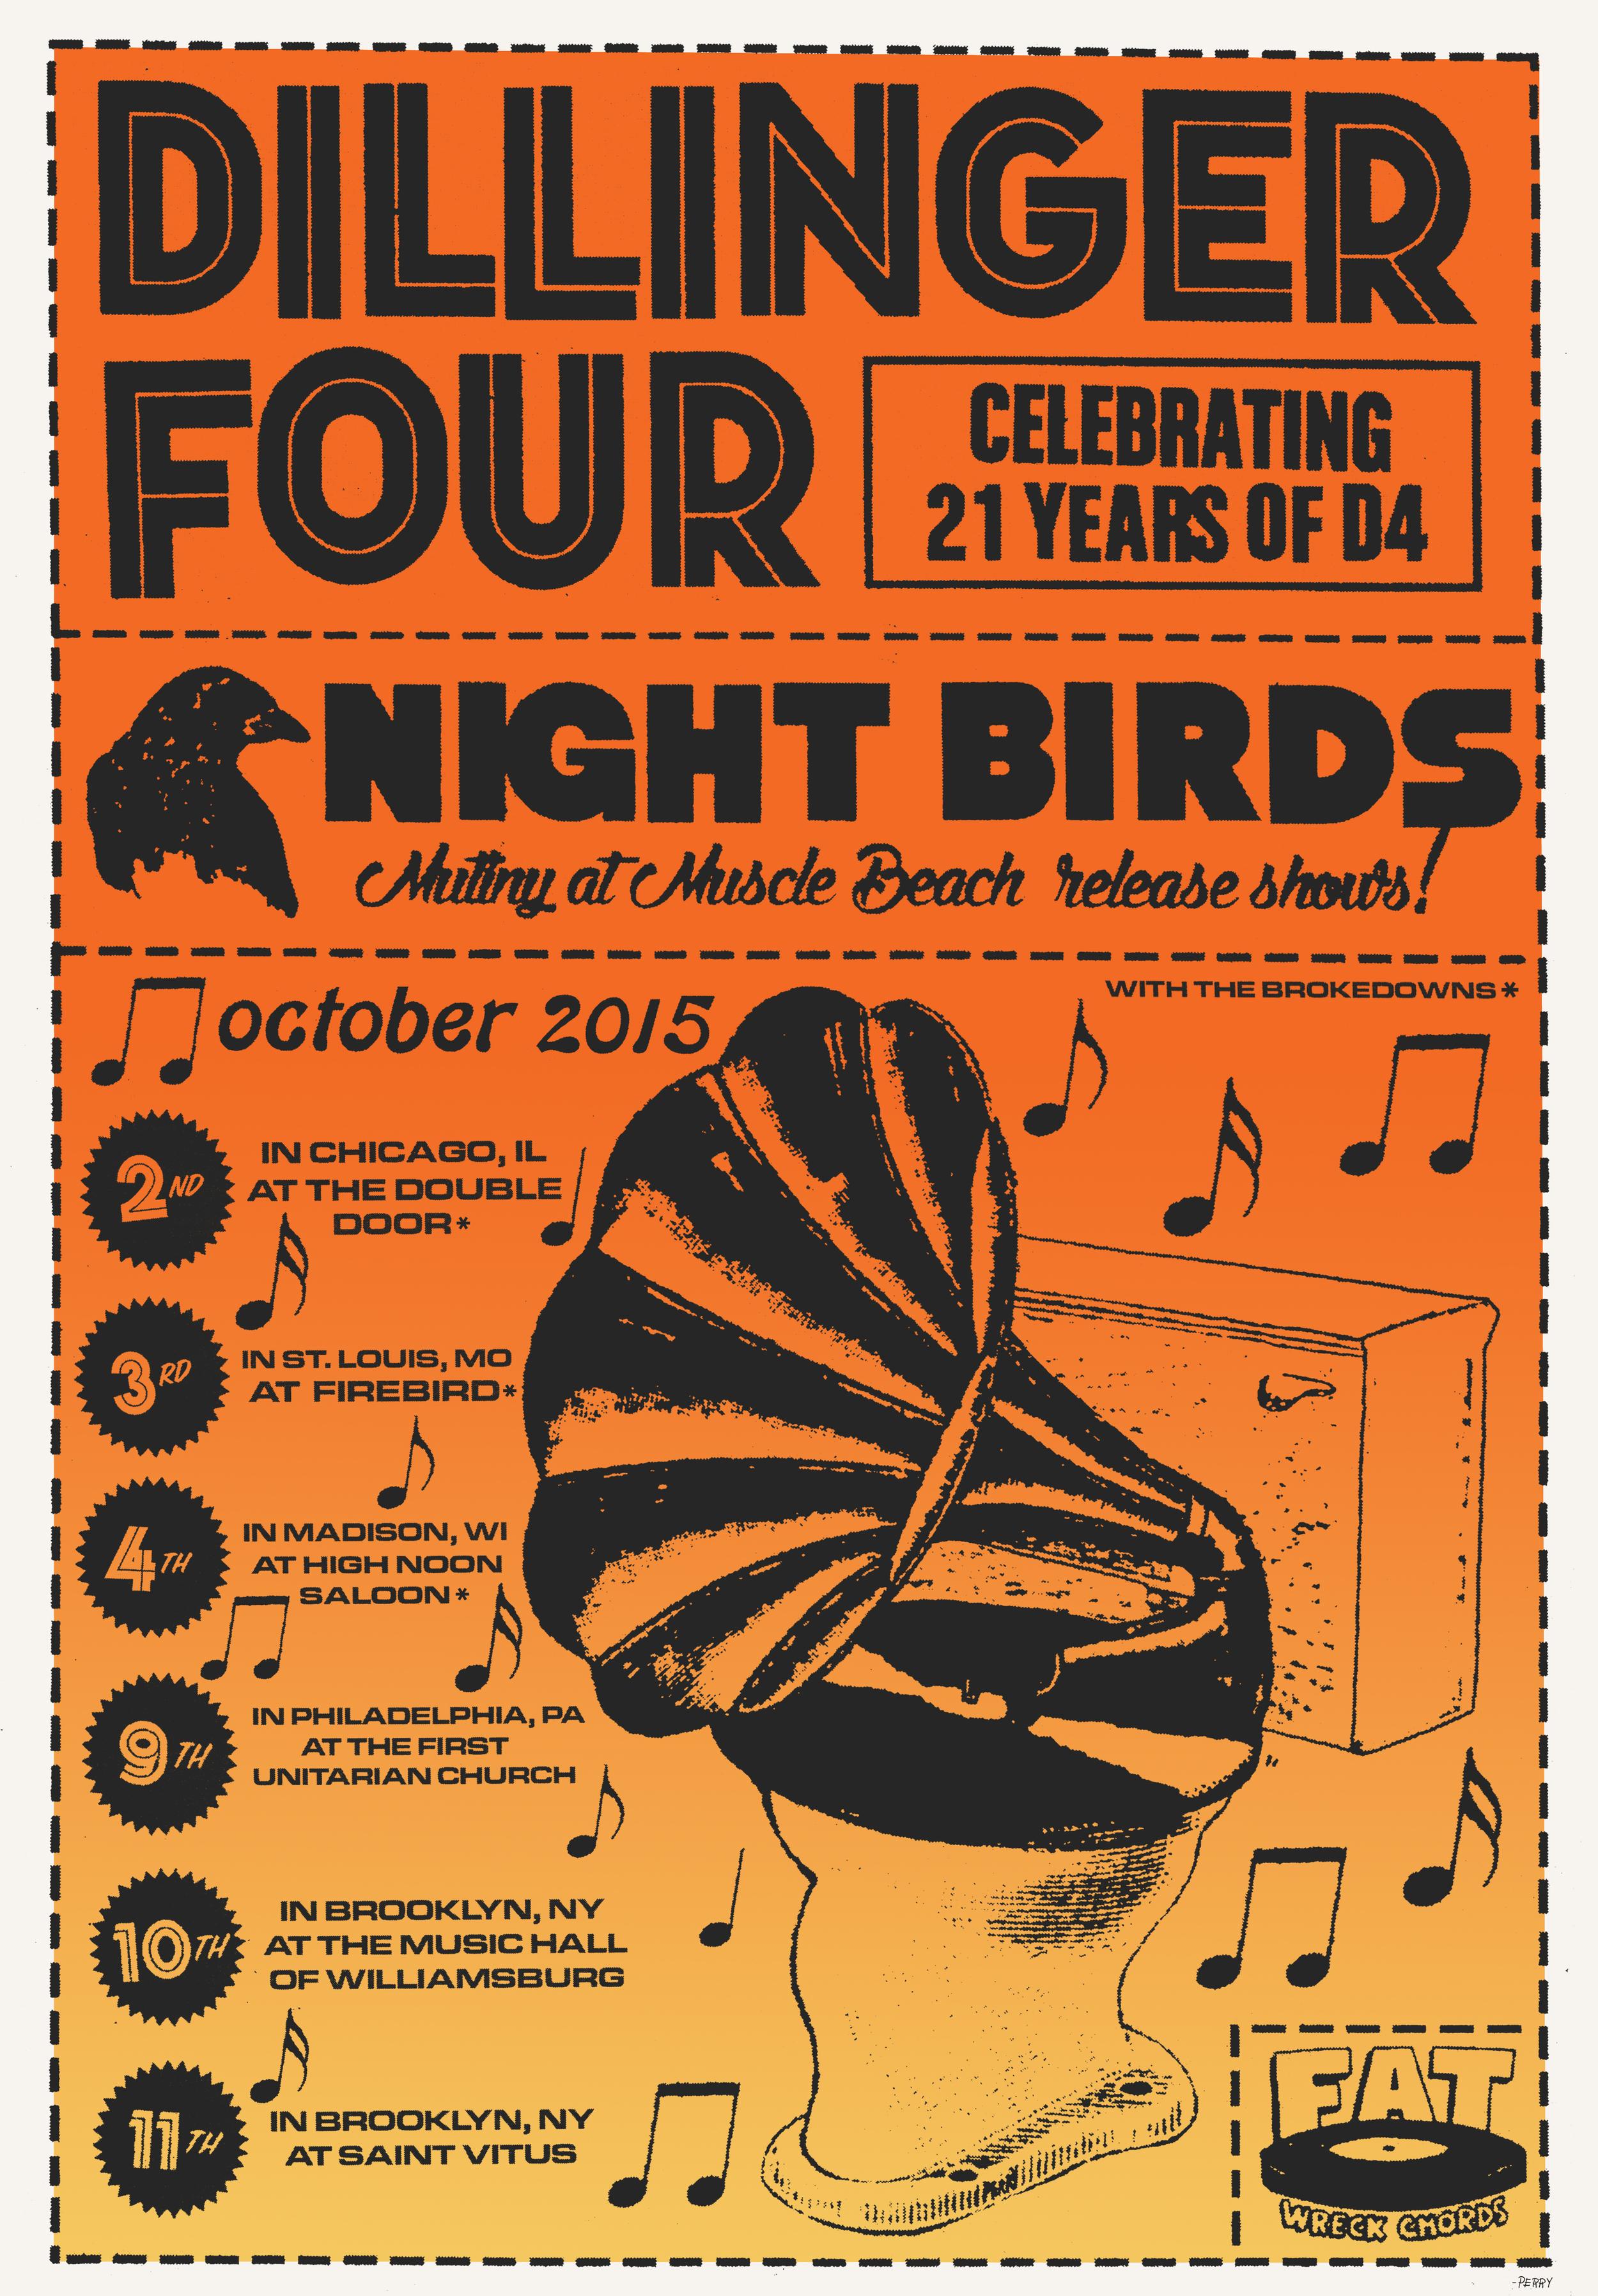 night birds poster more dates.jpg